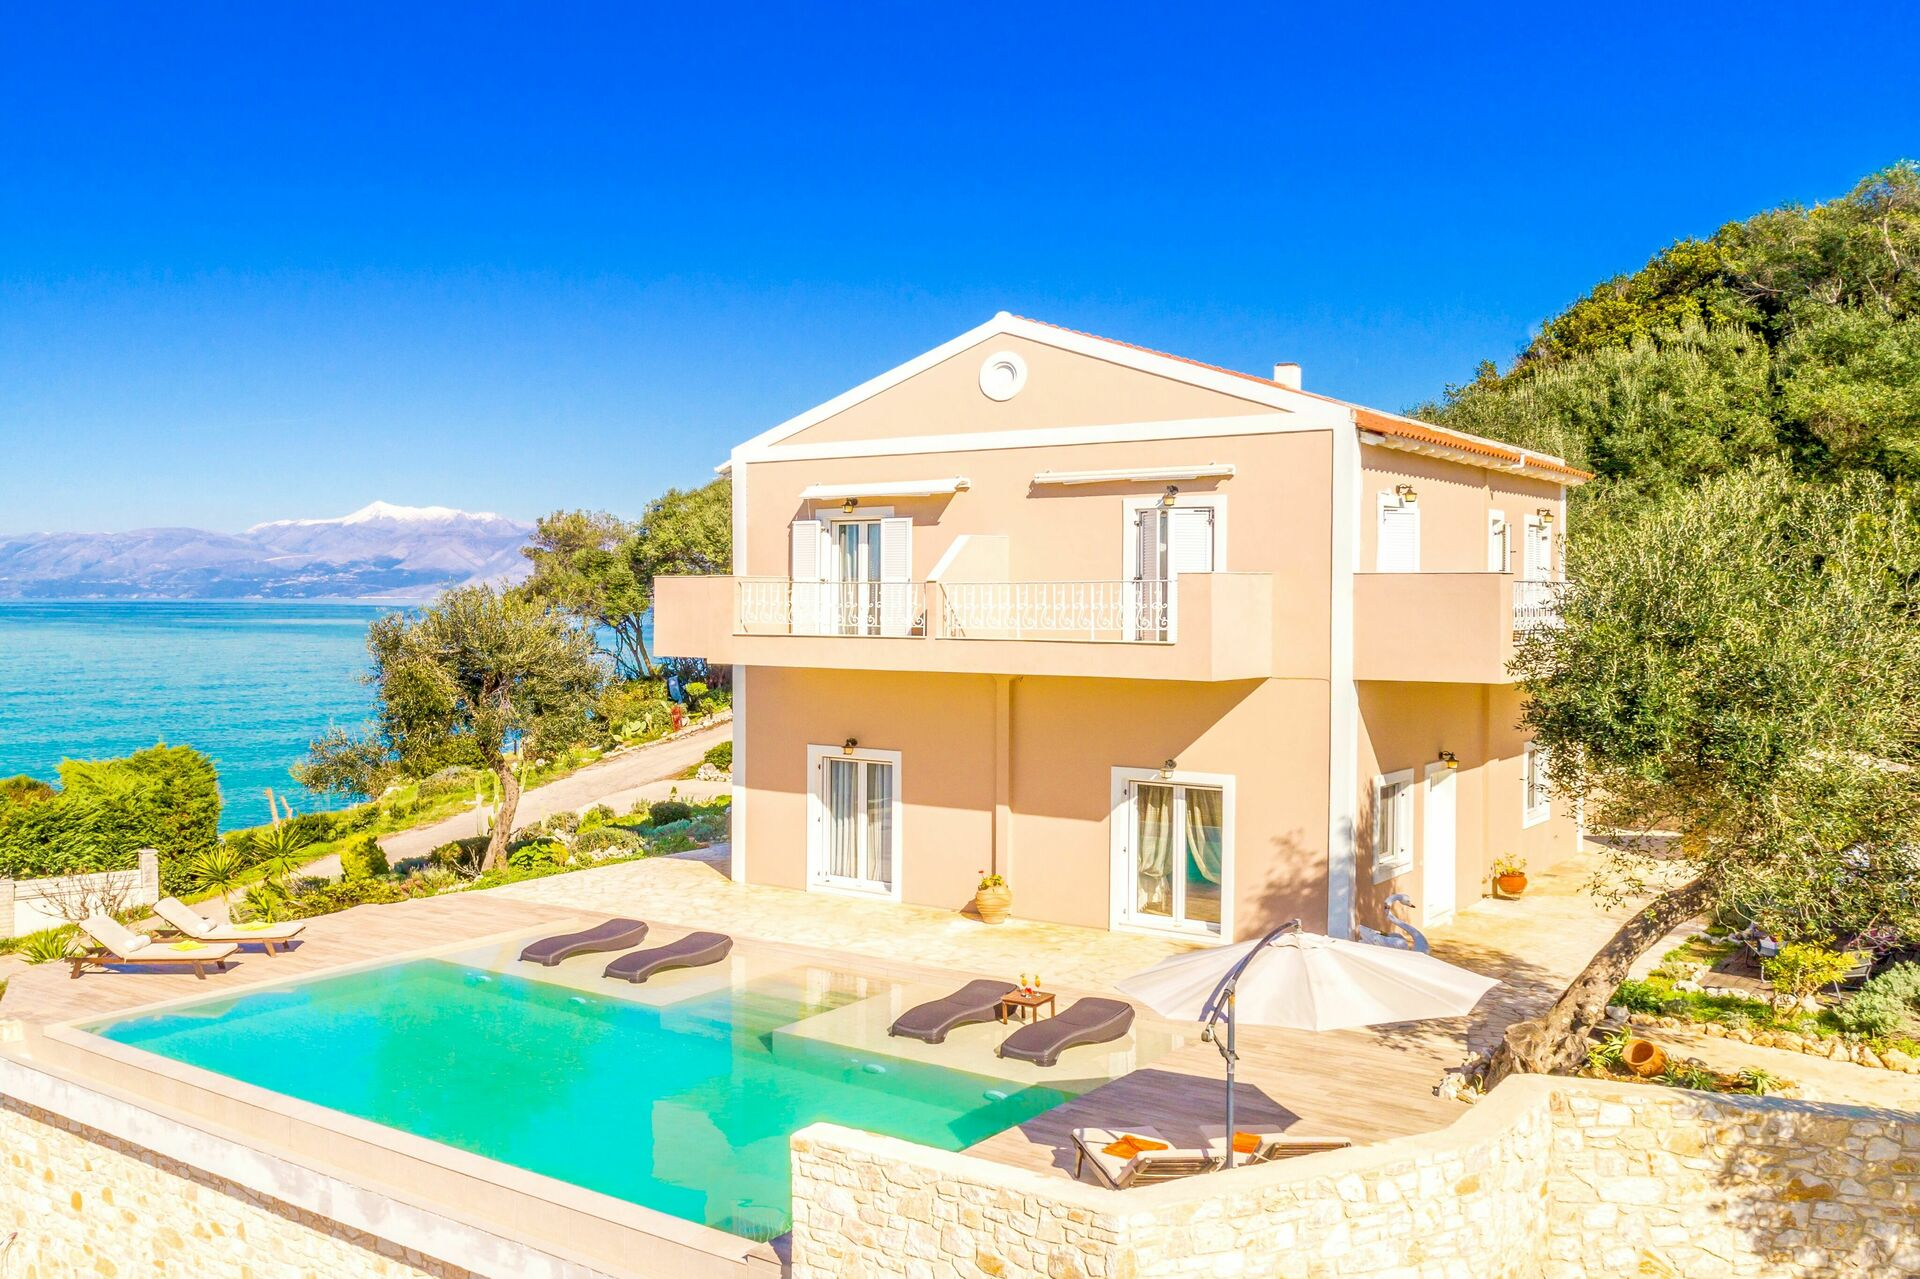 Beachfront Villa Seawave, Seaside Villa rental in Karniaris